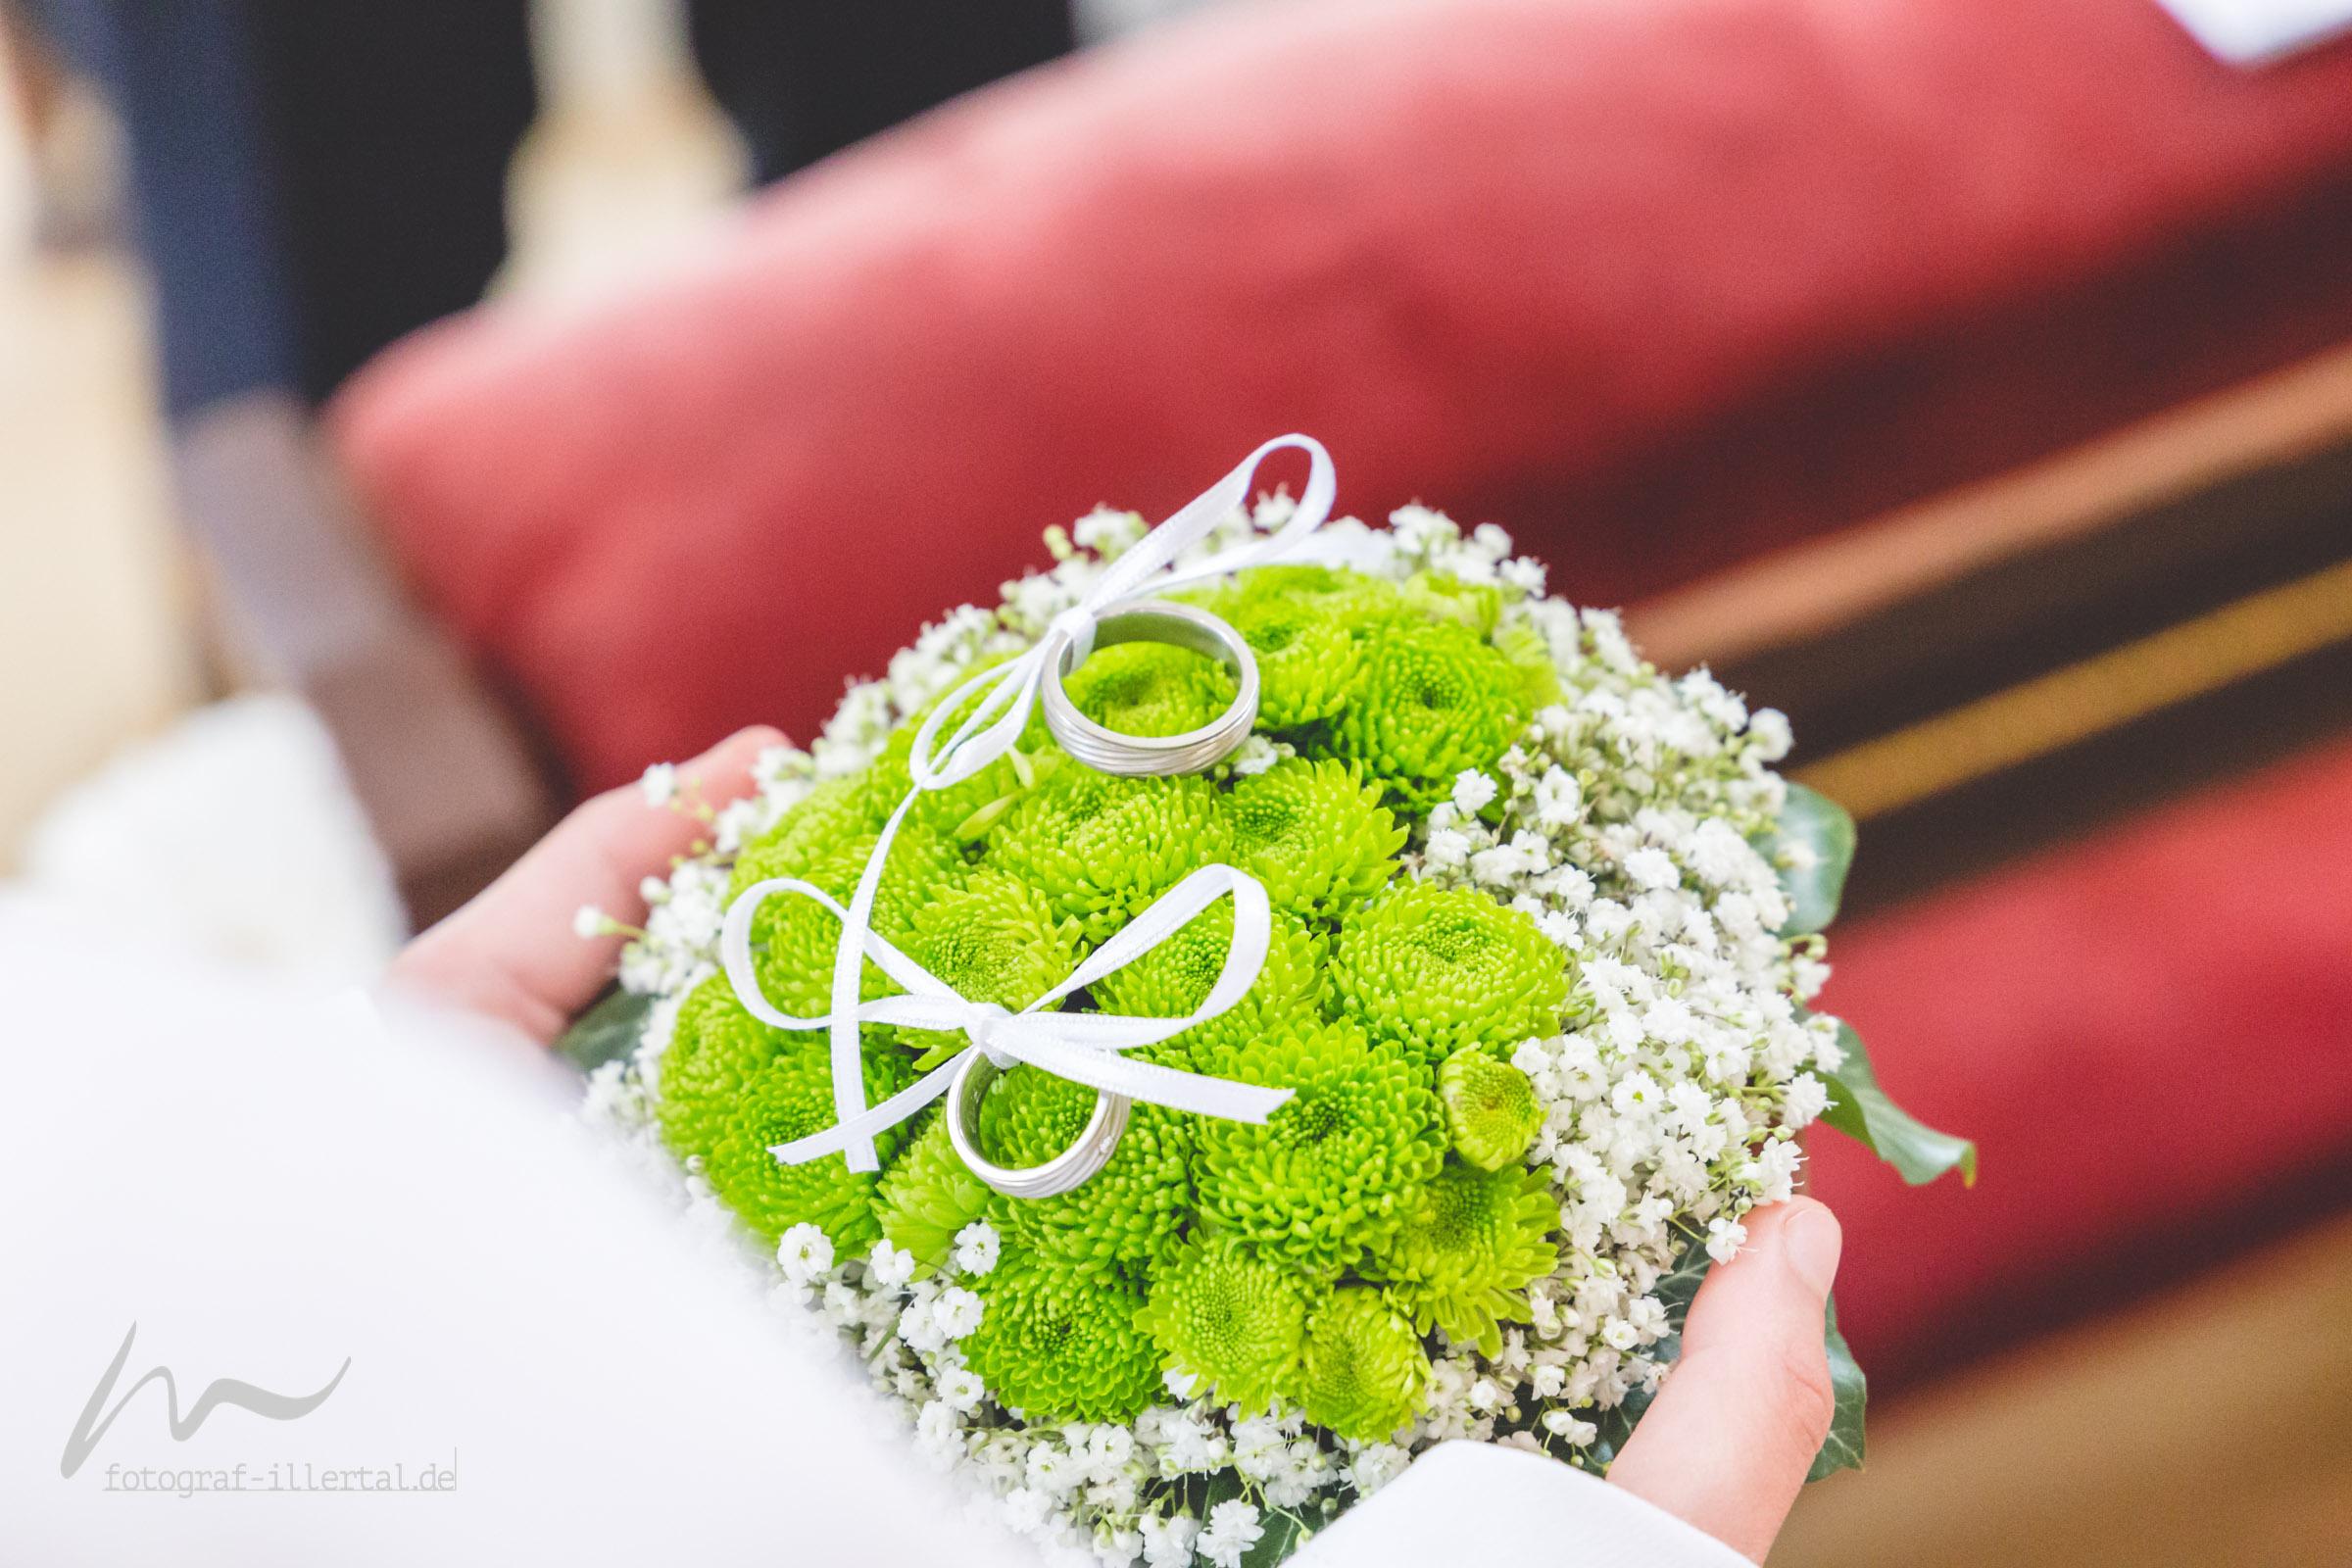 Fotograf Illertal-Christian Miller-Hochzeitsfotografie-_MG_4293